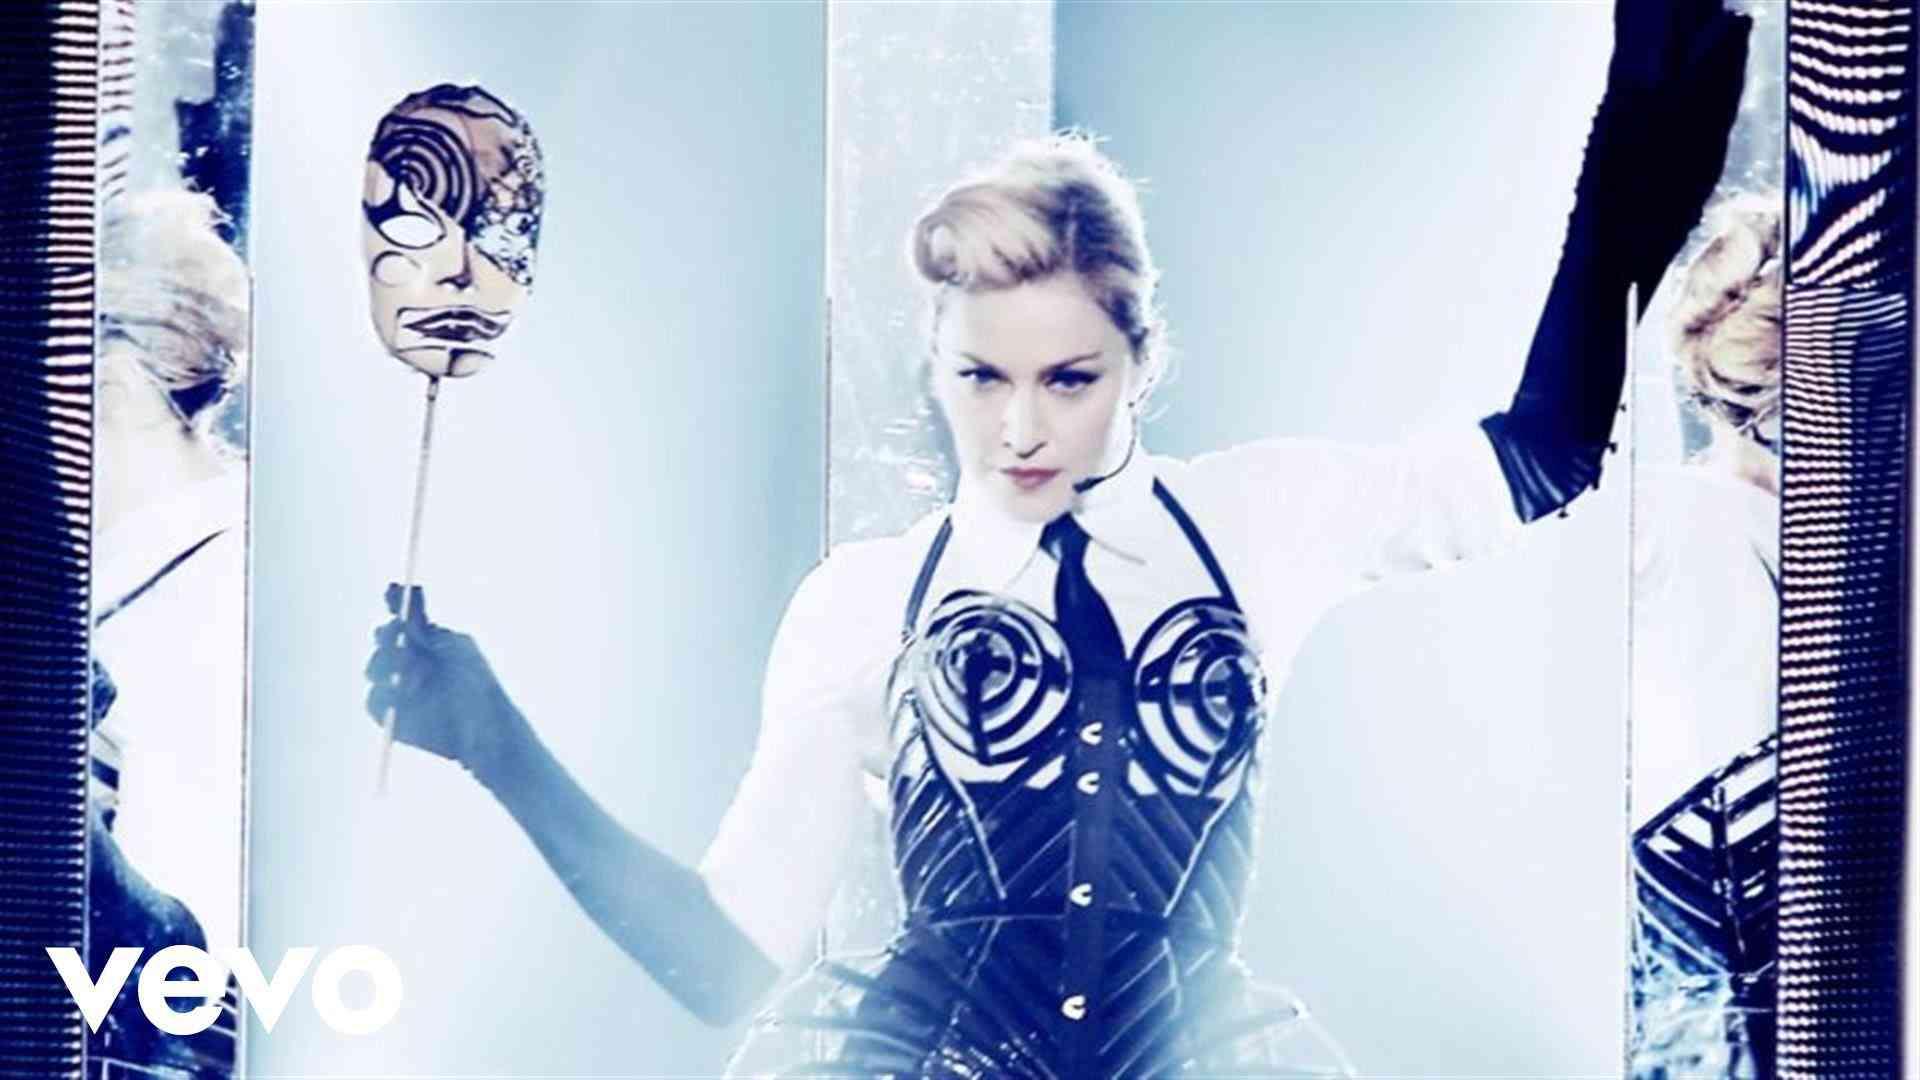 Madonna - Vogue (MDNA World Tour) - YouTube